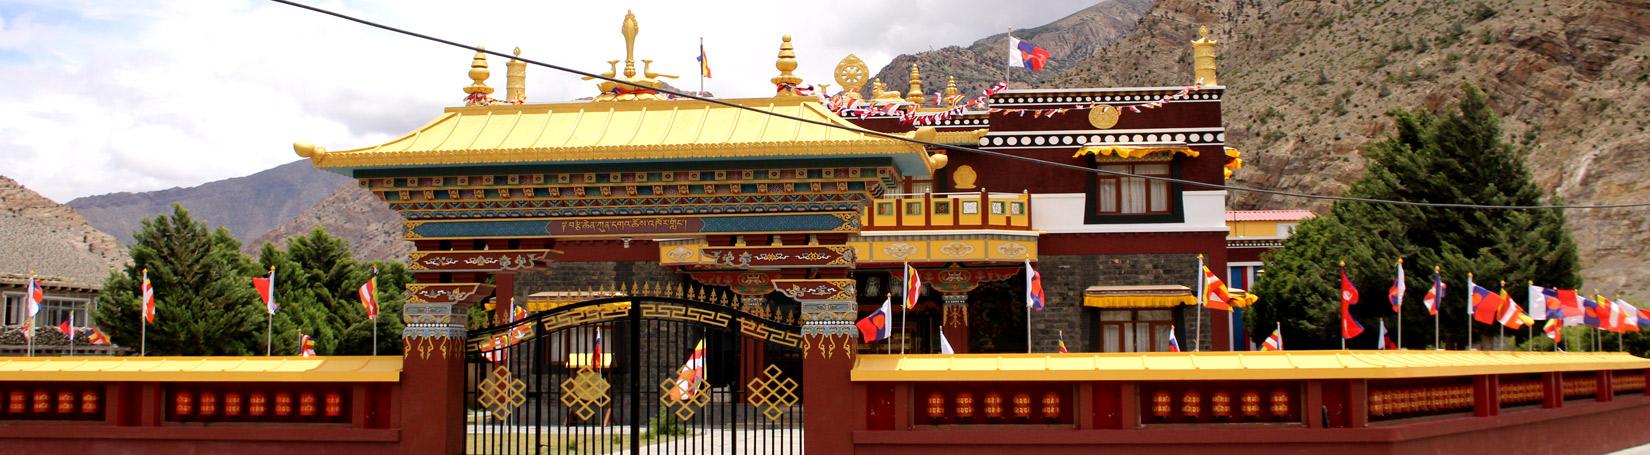 BUDDHIST MONASTERY IN JOMSOM